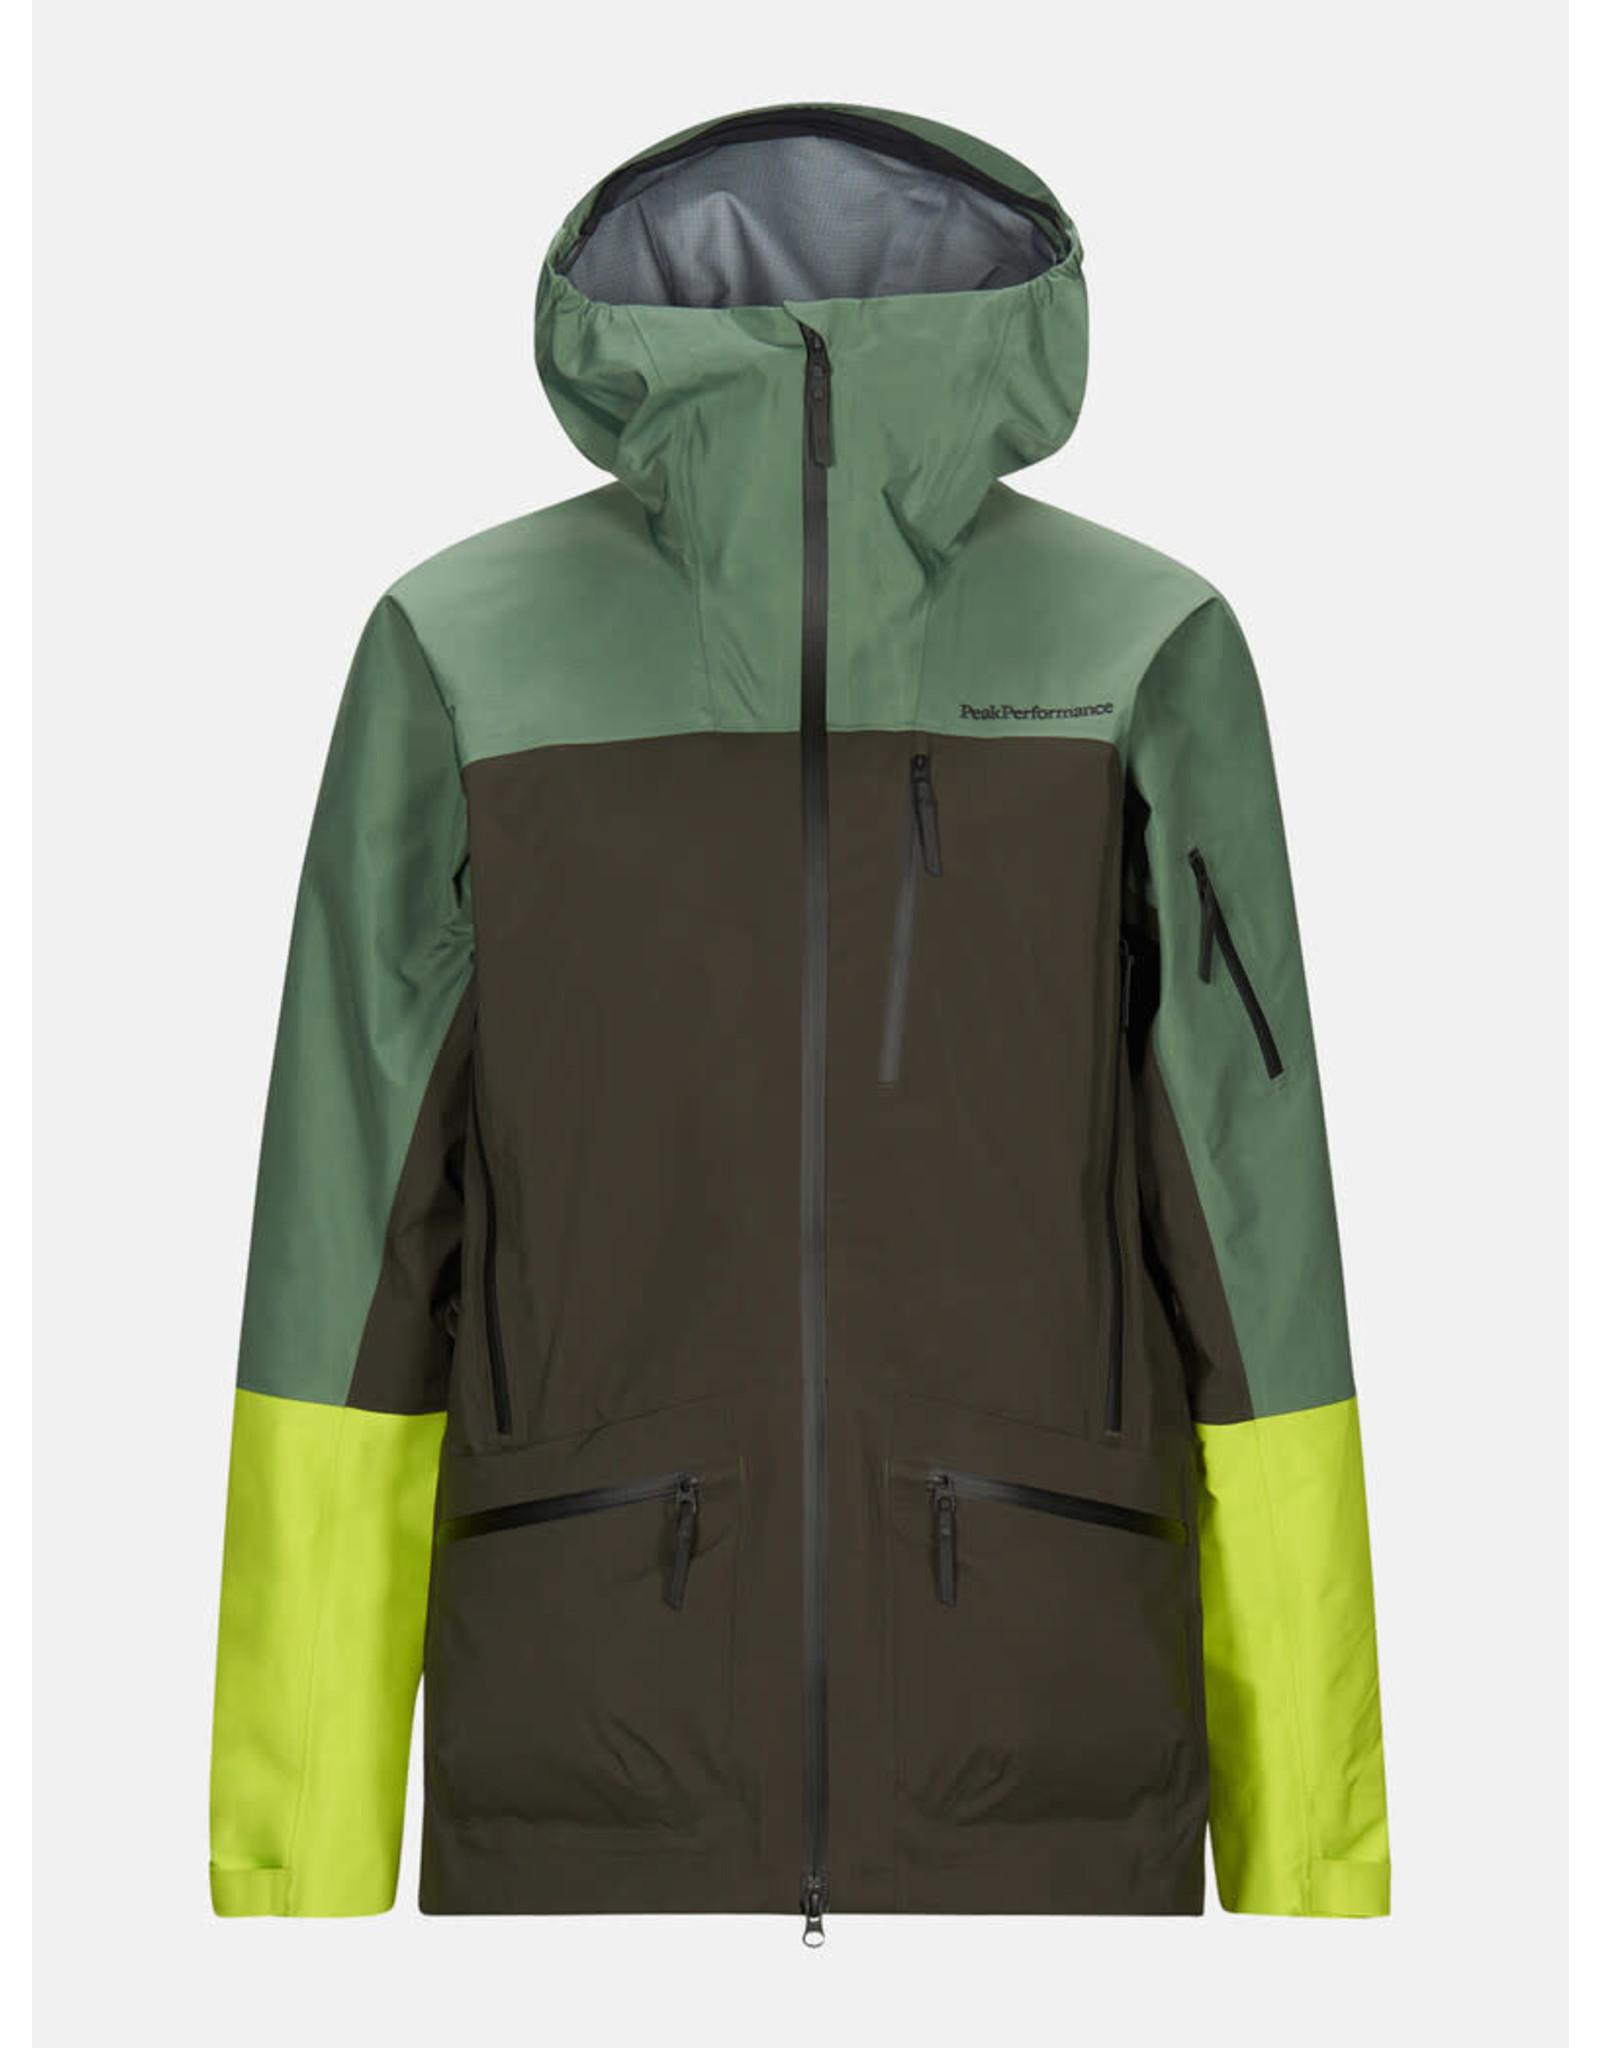 Peak Performance Vislight PRO Ski Jacket Men